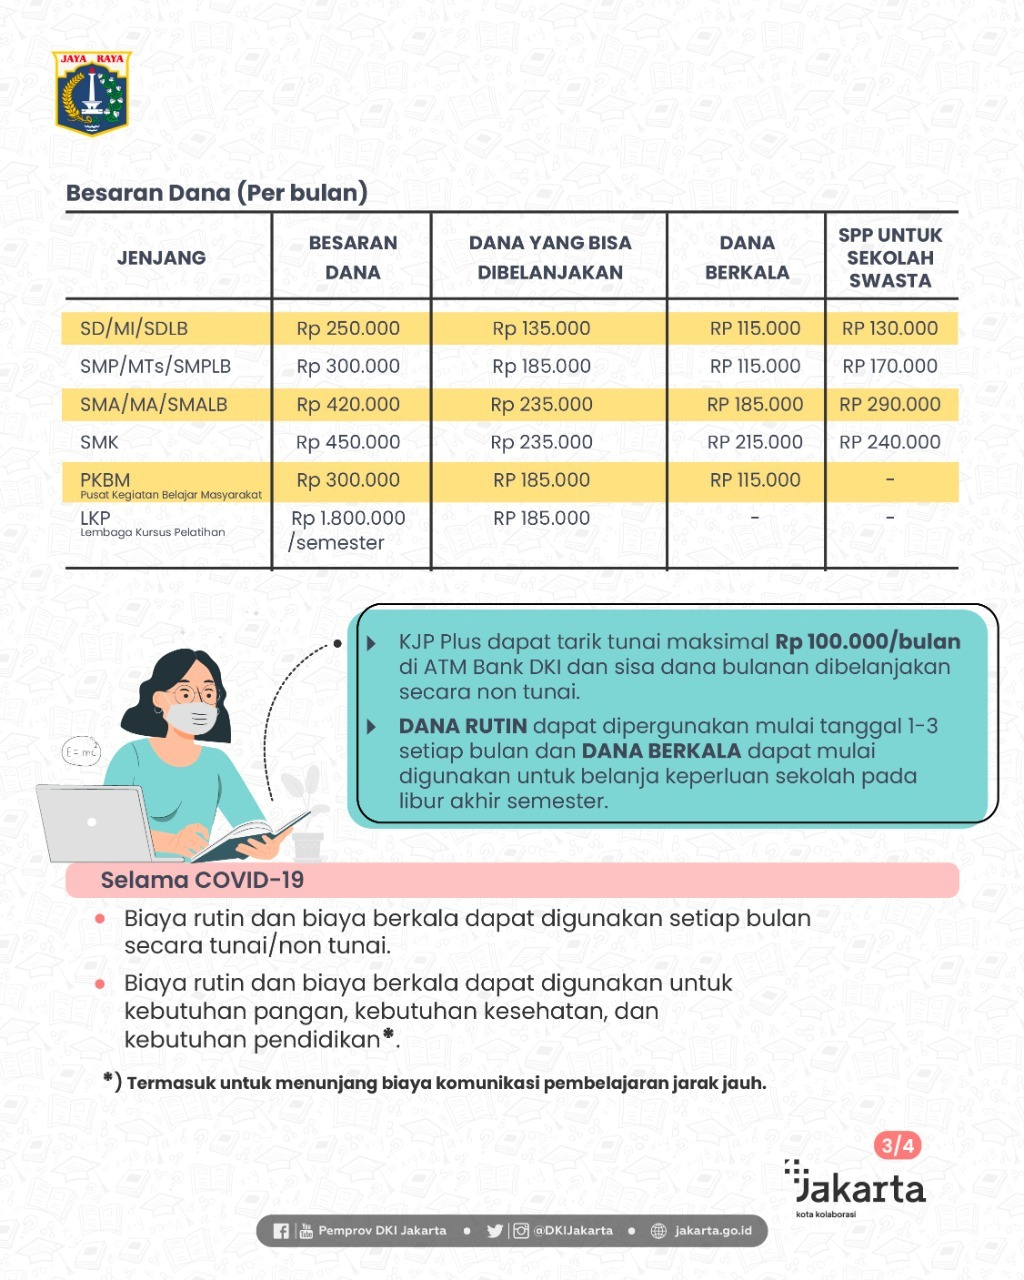 Tuntas Pendidikan Dengan KJP Plus Tahap 1 Tahun 2021-Slide_3